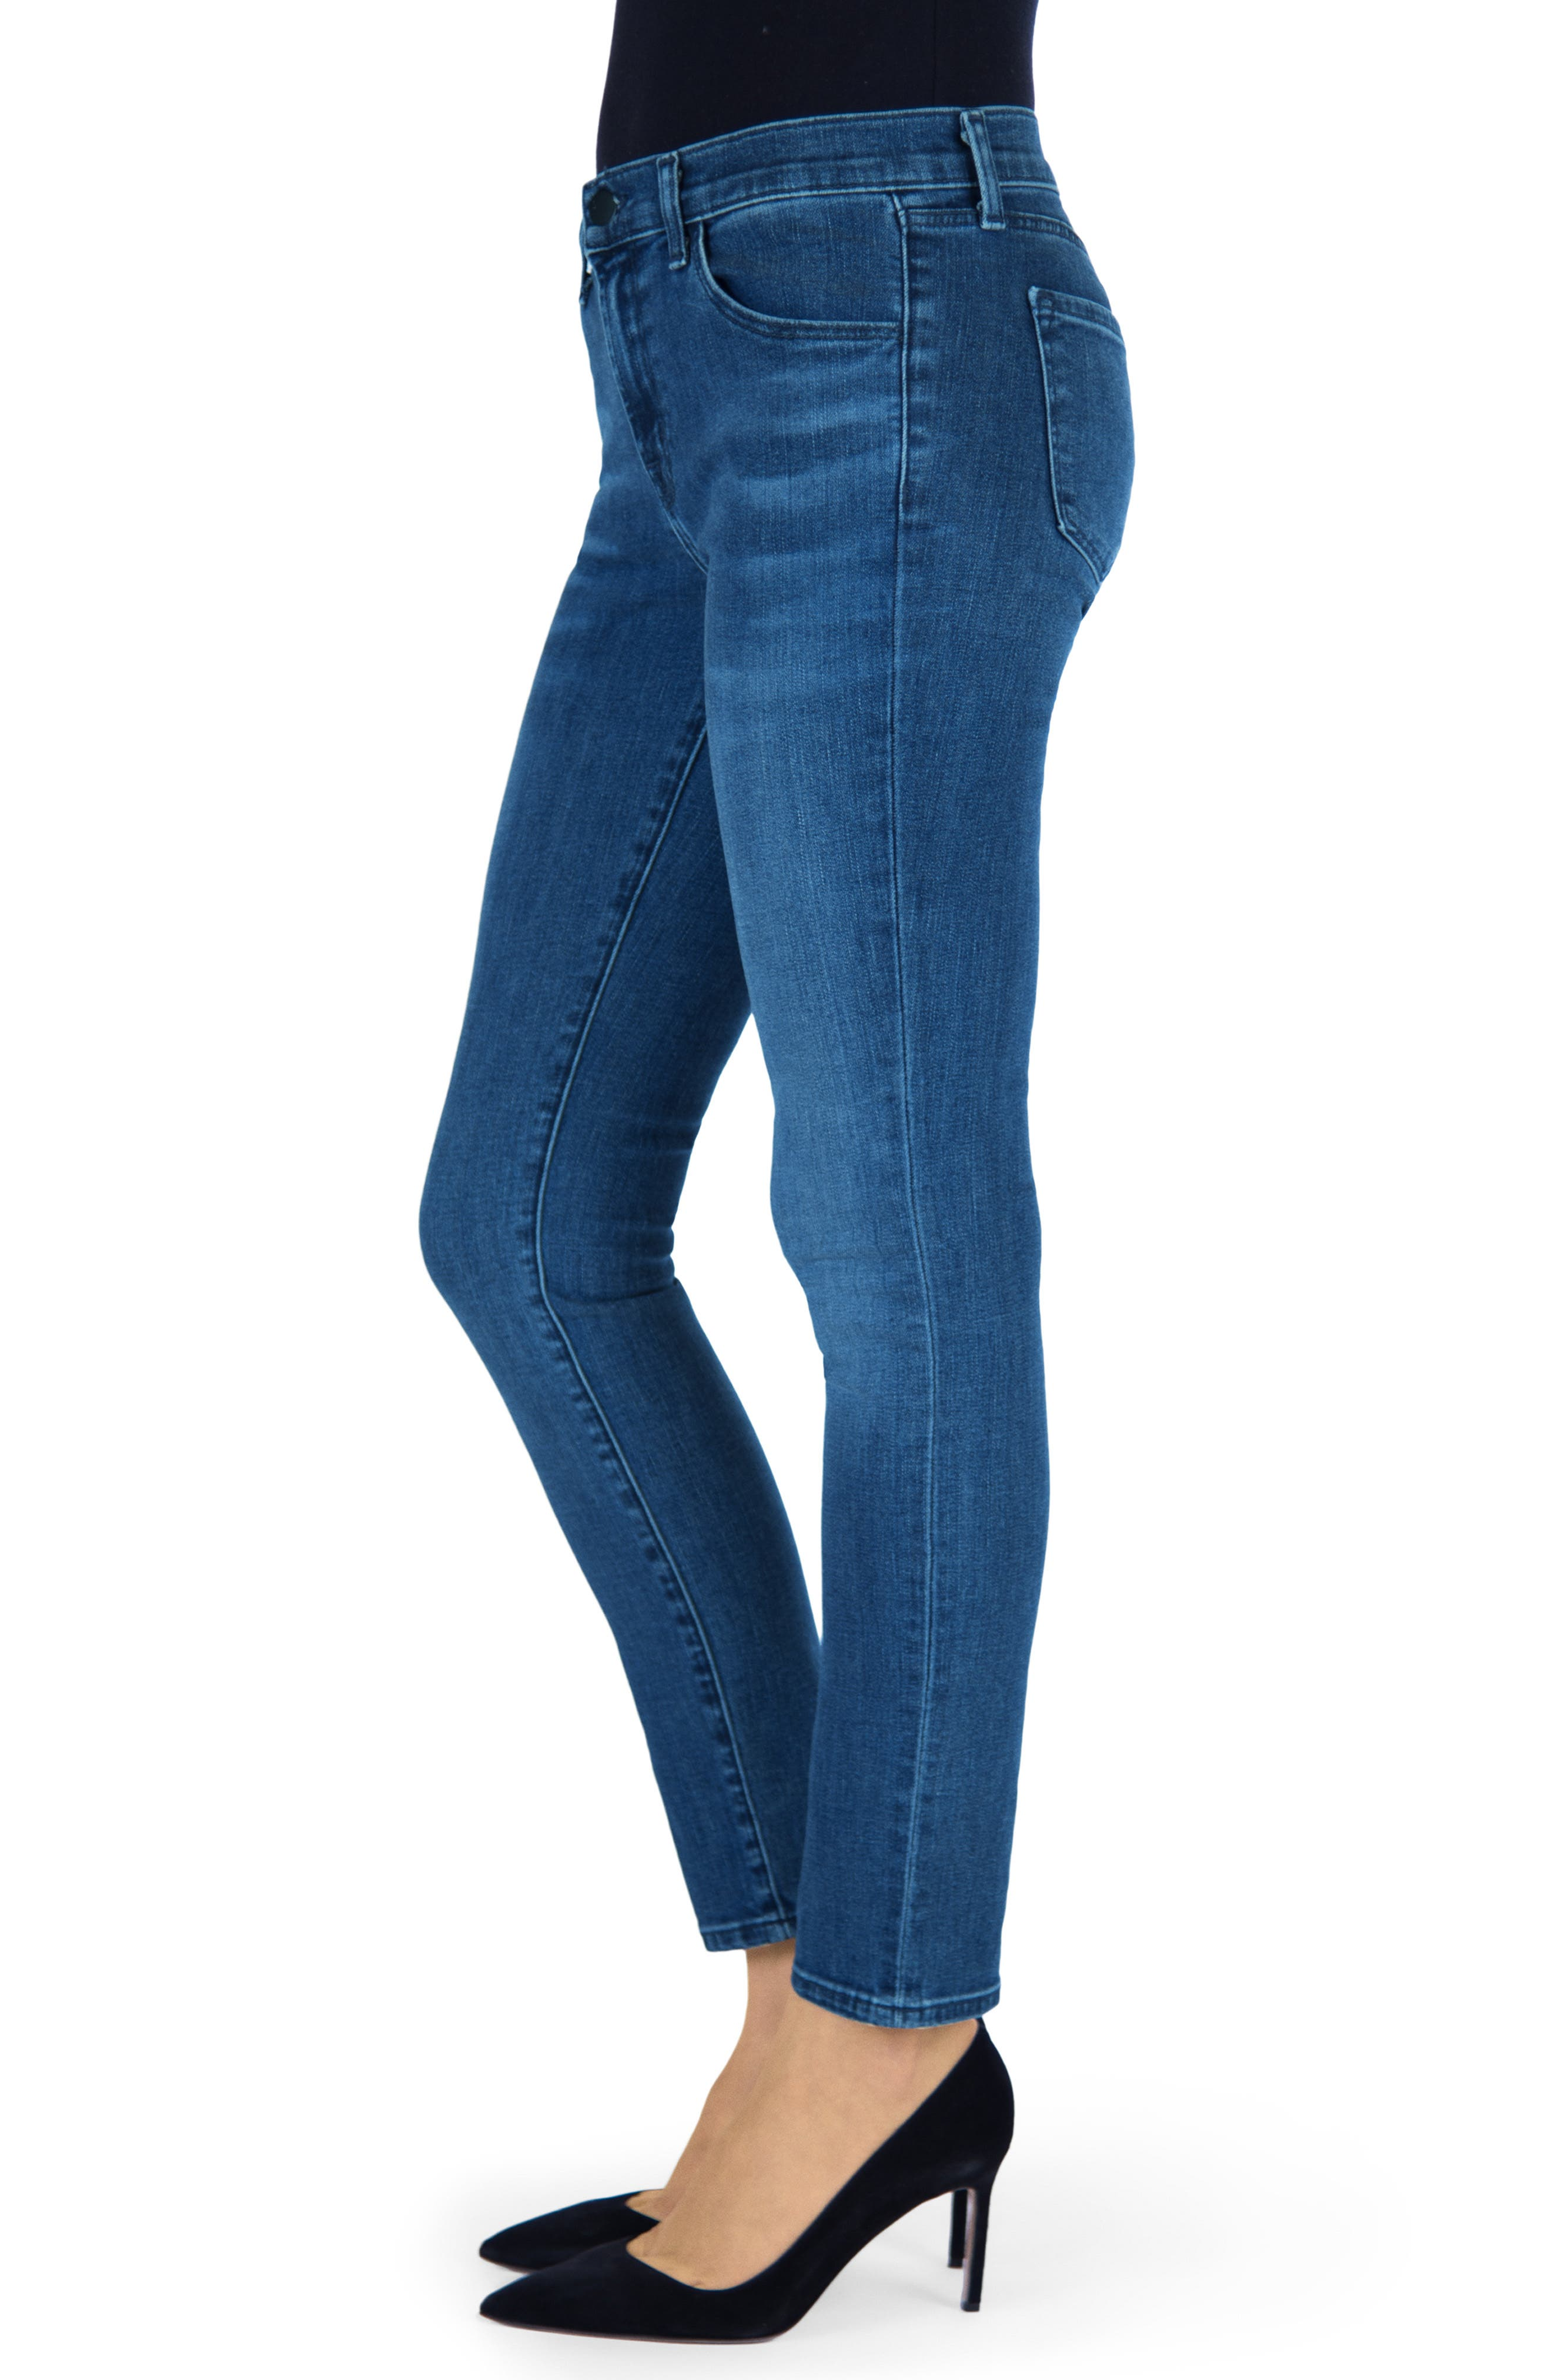 811 Skinny Jeans,                             Alternate thumbnail 3, color,                             Fuse